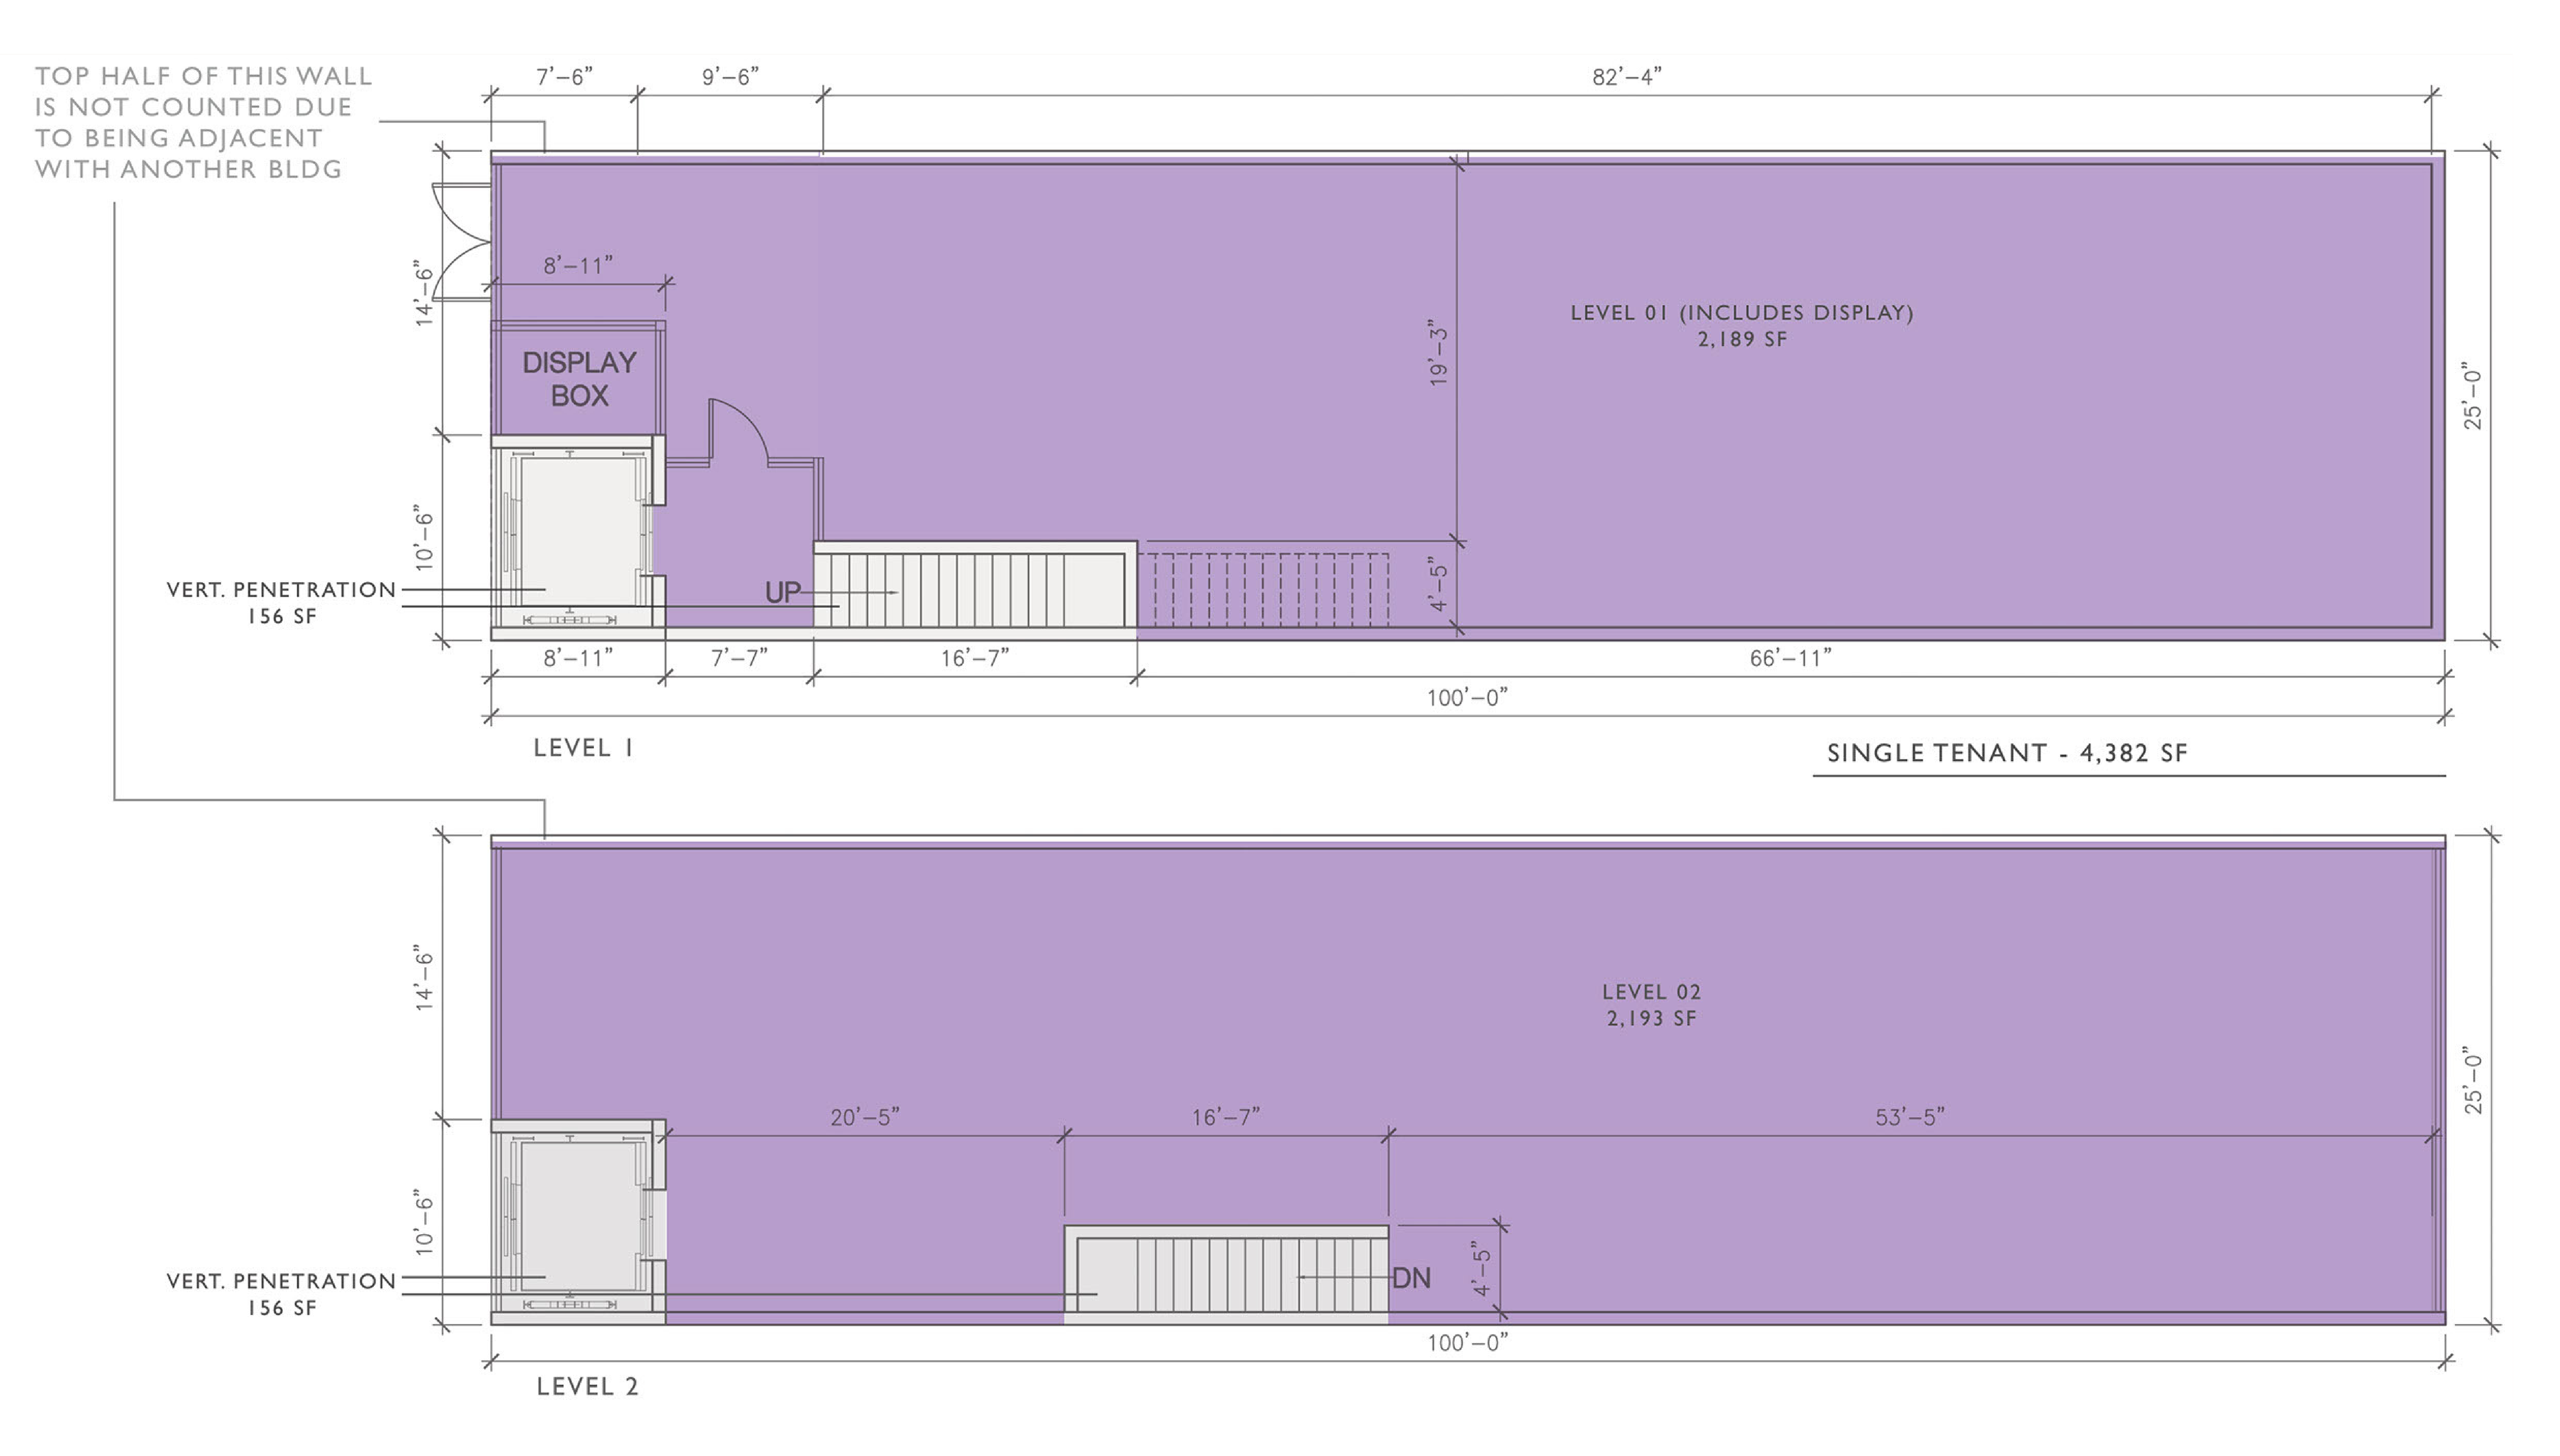 1519 Main St: site plan